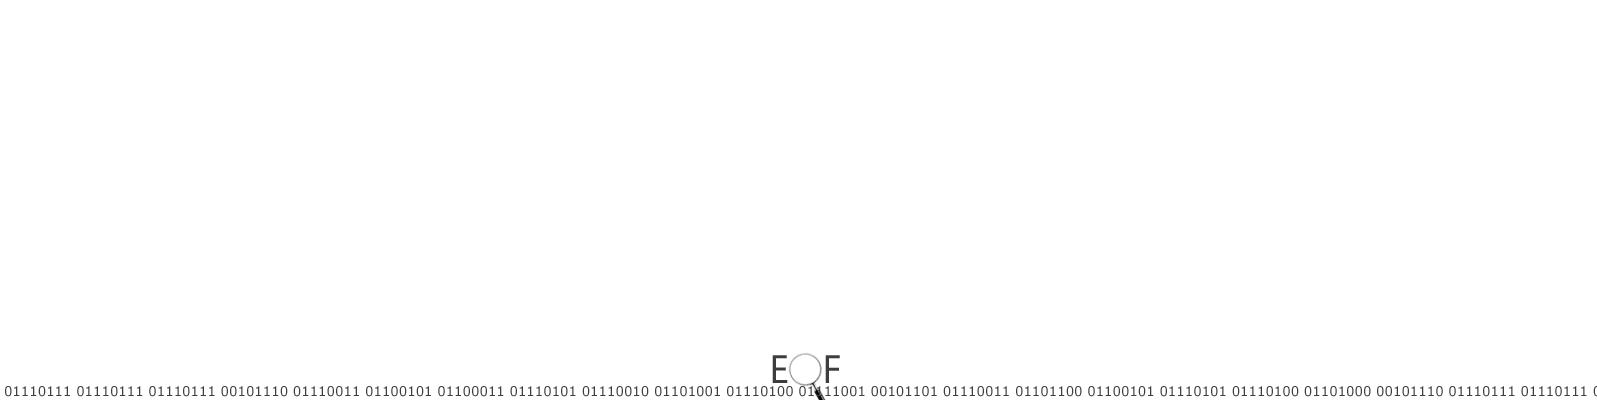 EOF copy.png